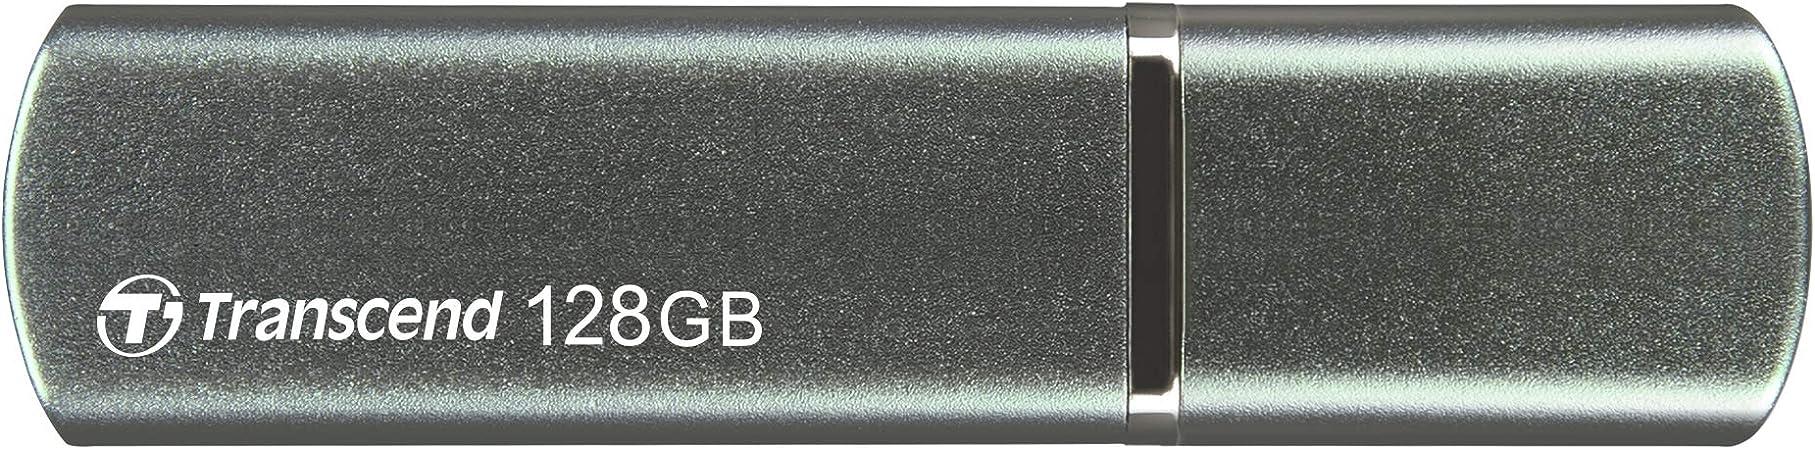 Transcend Highspeed Usb Stick 128gb Jetflash 910 Usb3 1 Computer Zubehör